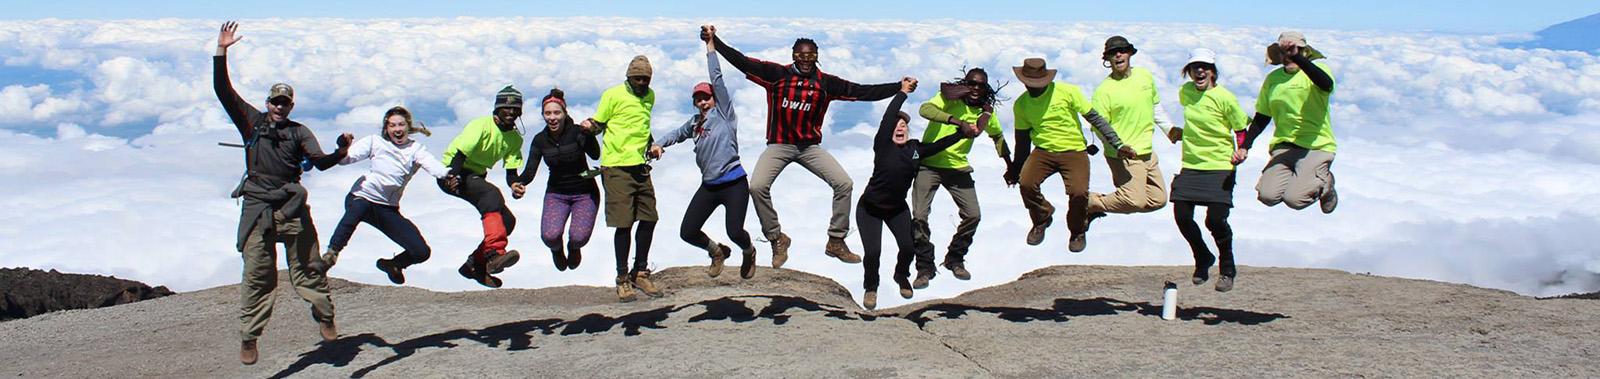 climb kilimanjaro dates 2021